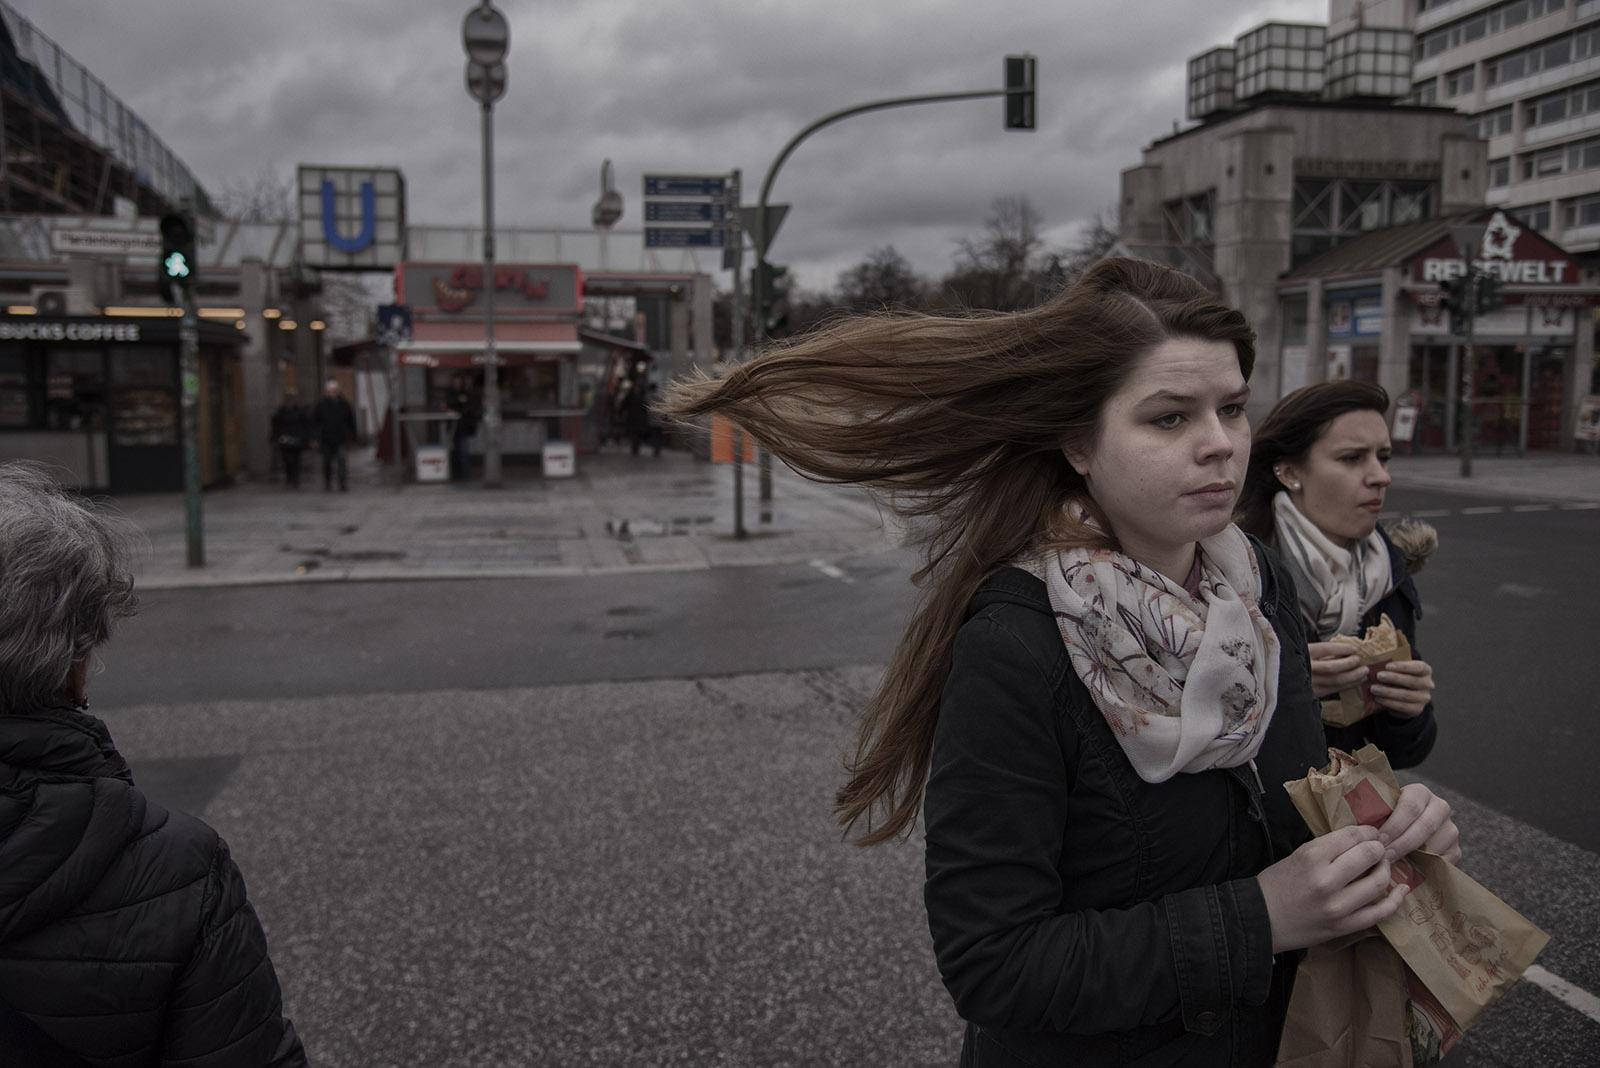 berlino_street_003.jpg